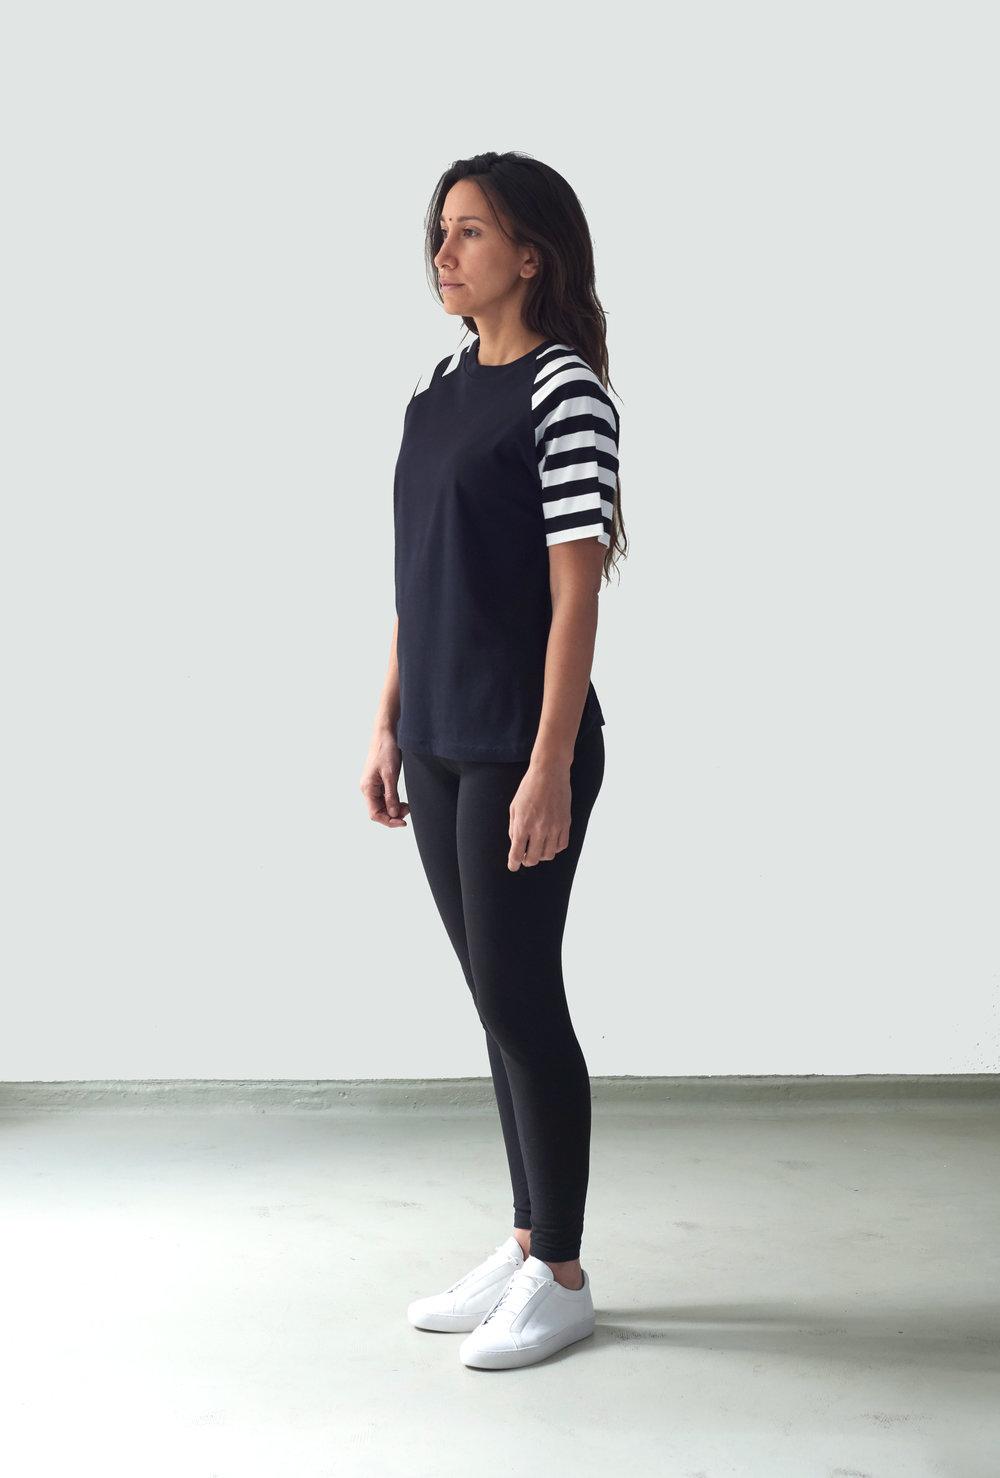 black stripe tee.jpg